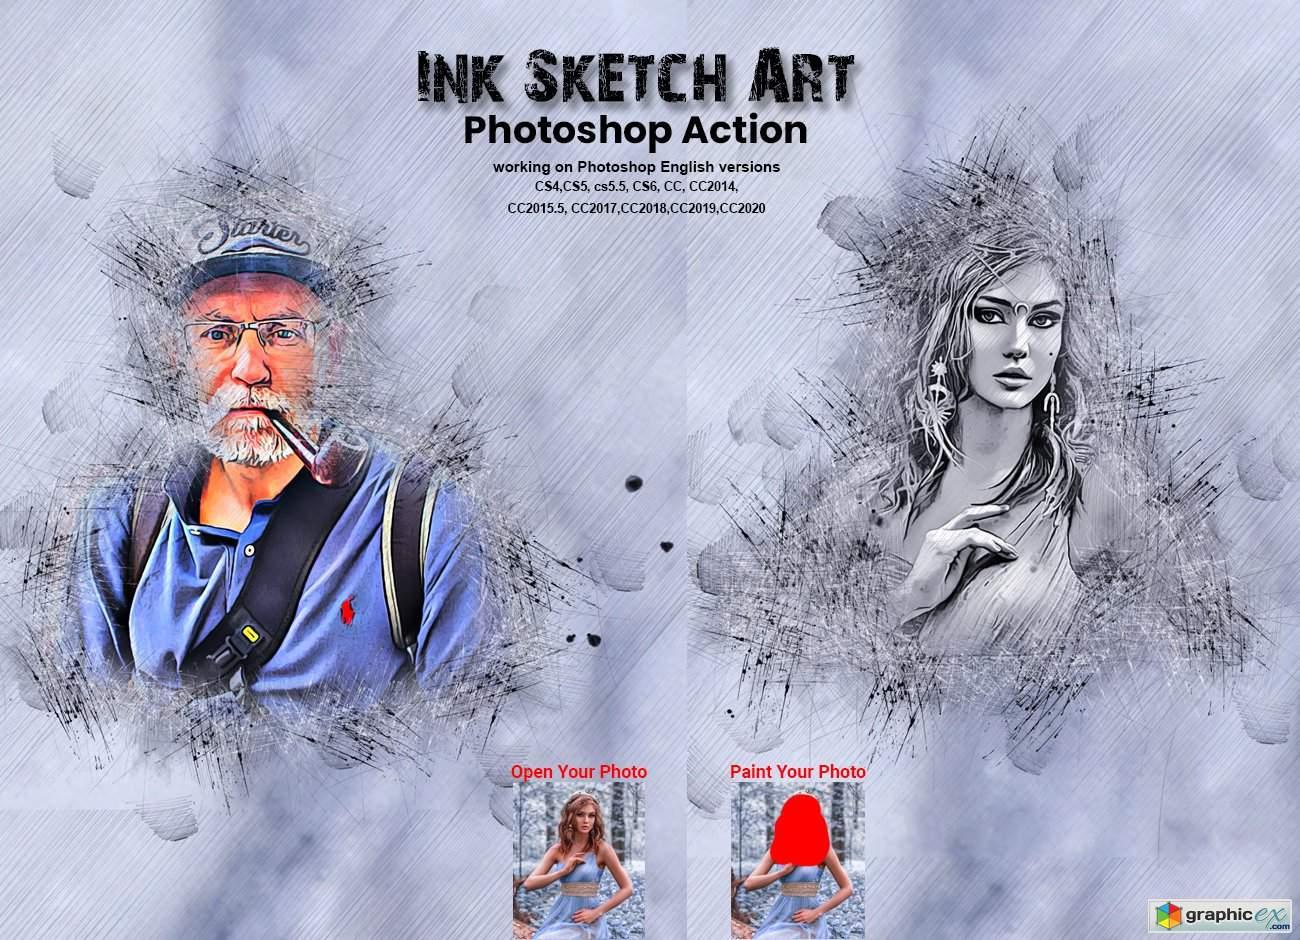 Ink Sketch Art Photoshop Action